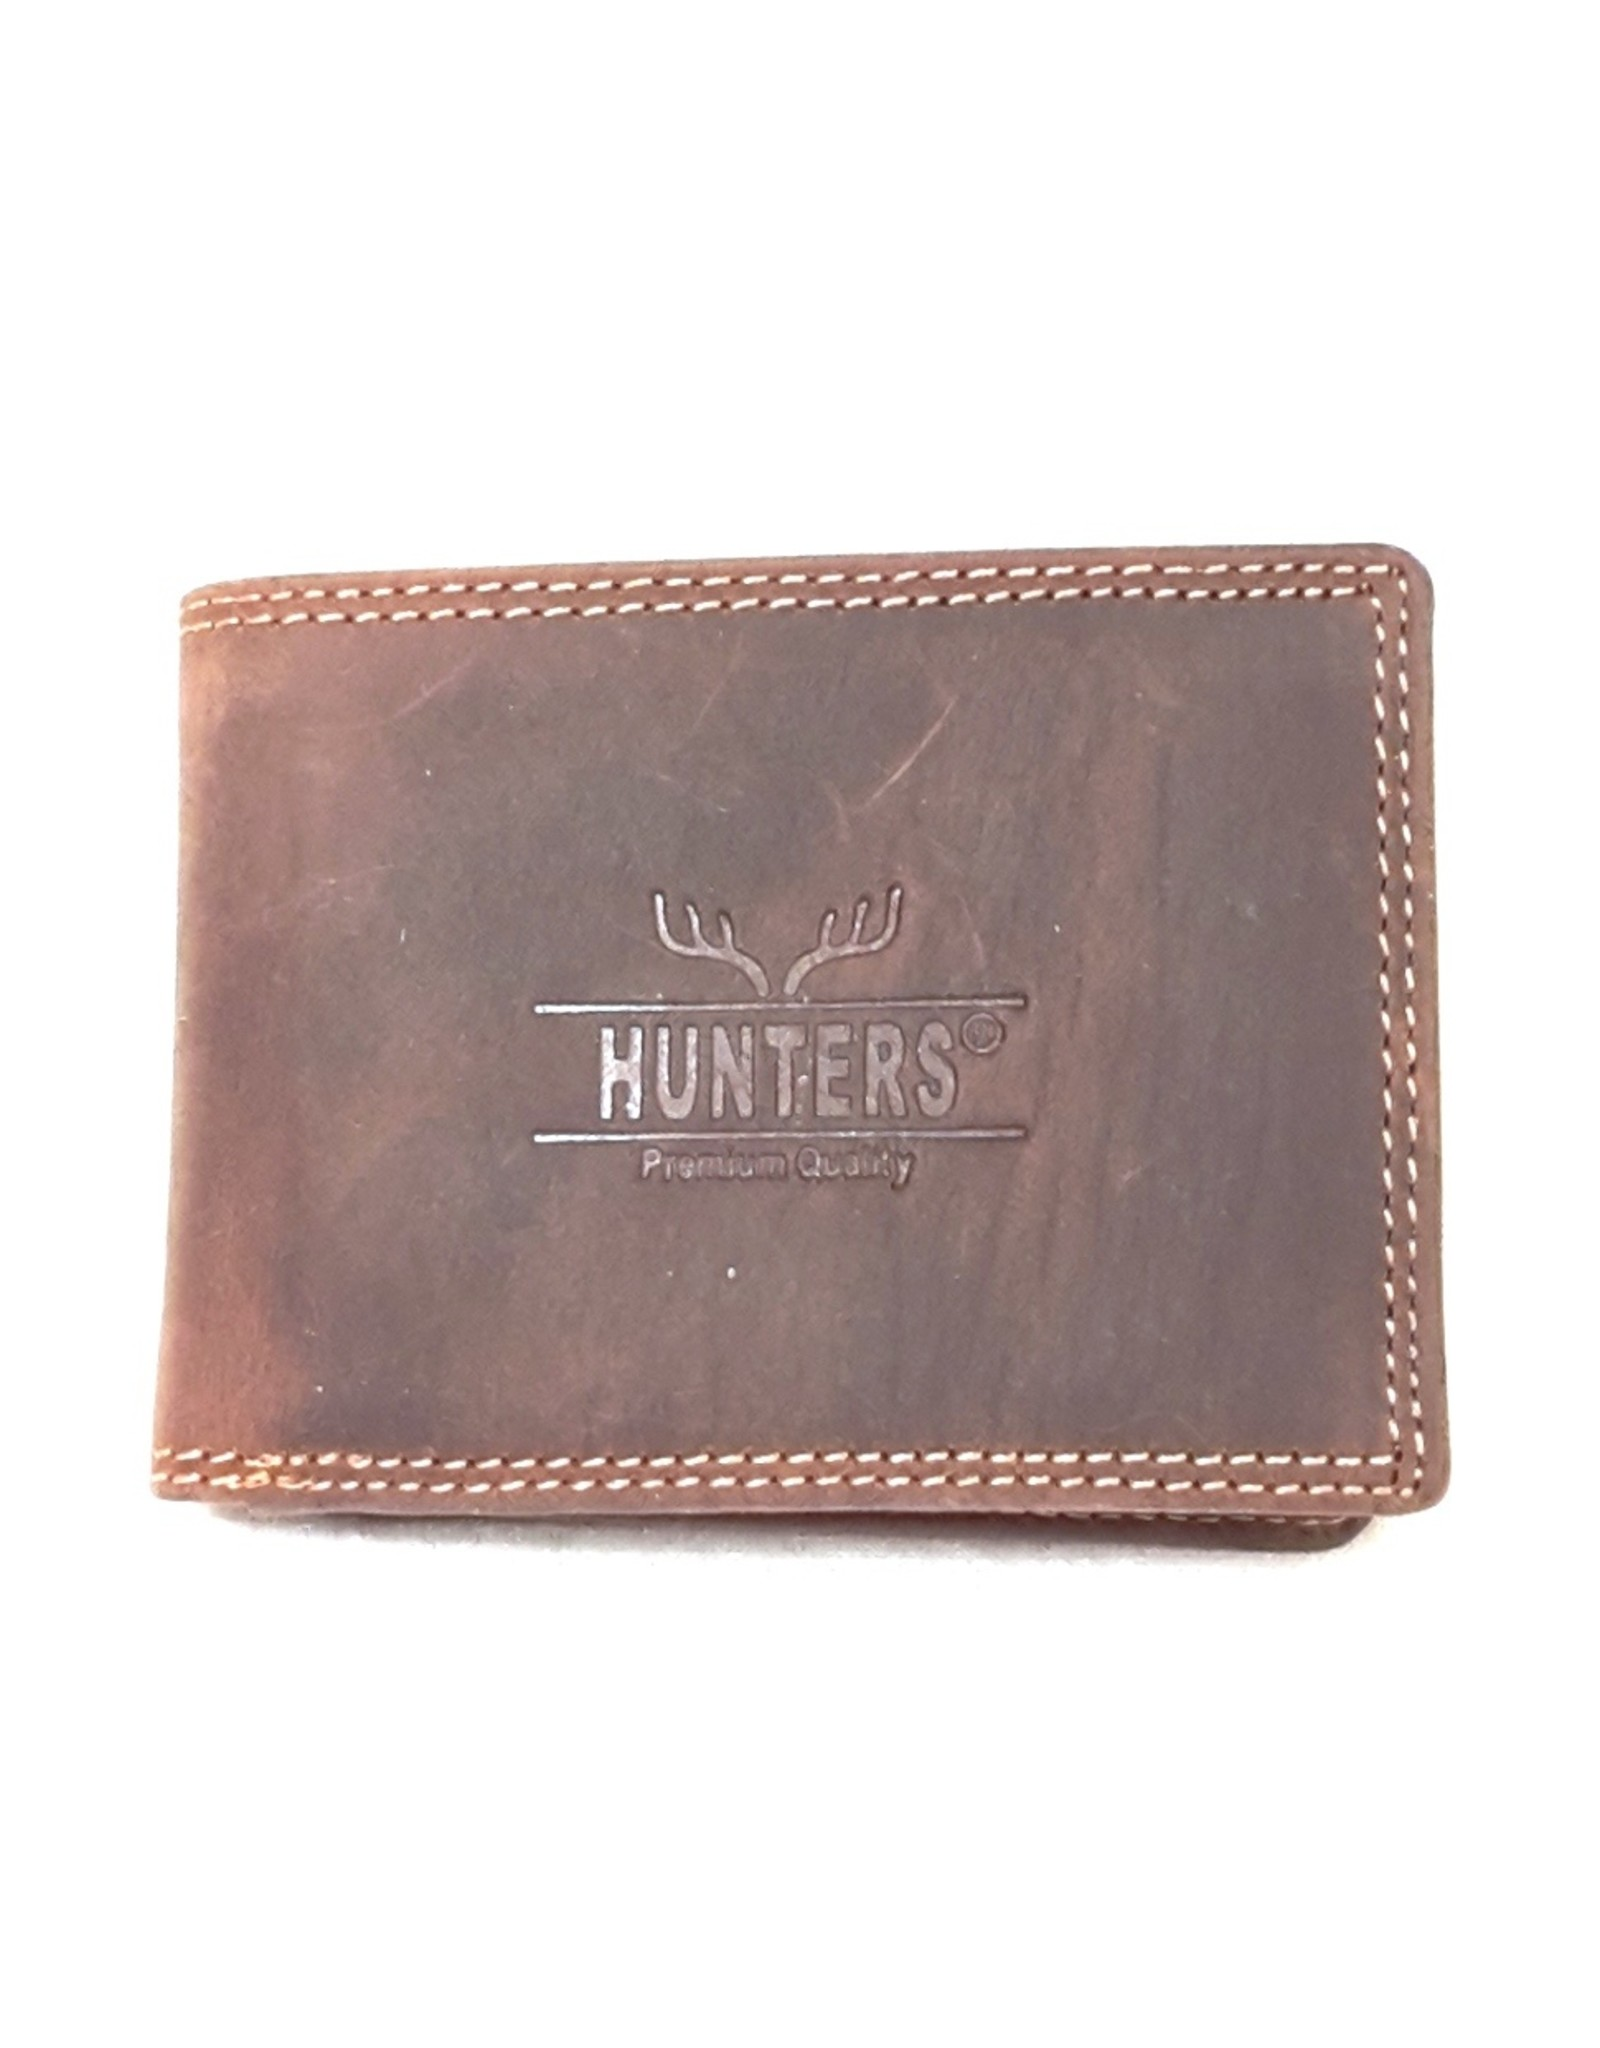 Hunters Leather Wallets - Leather wallet Hunters - Small format